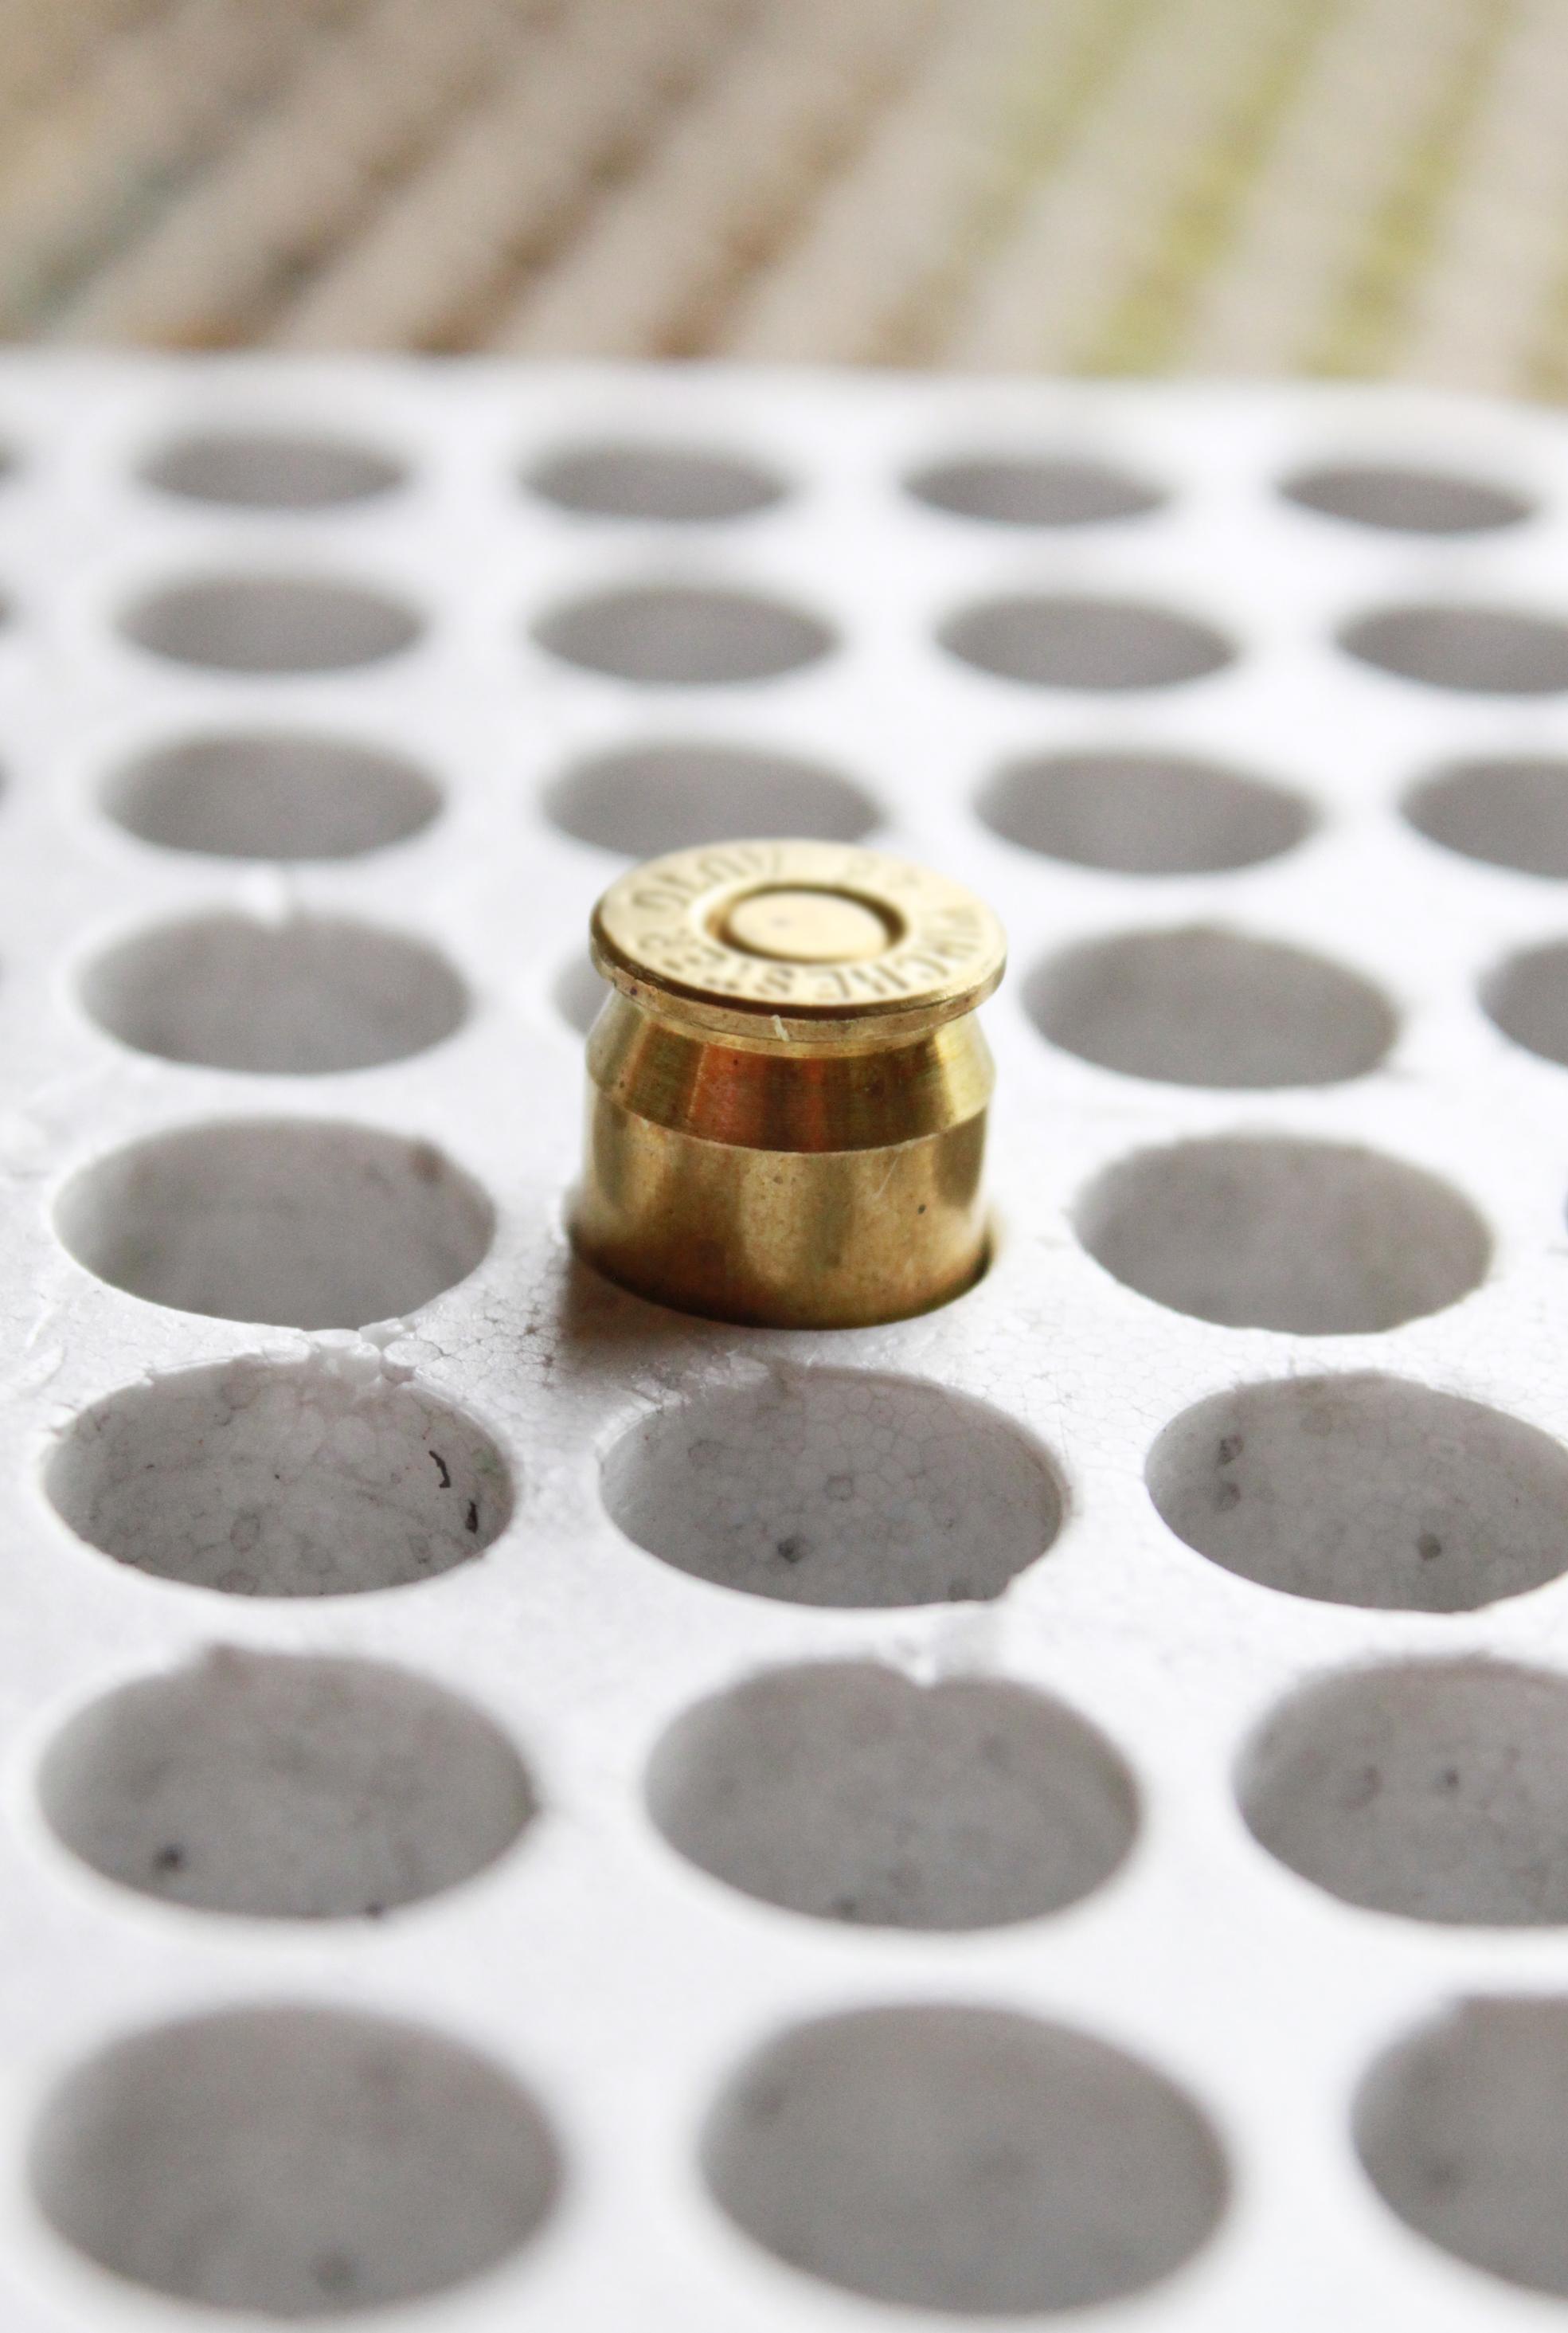 The last bullet photo